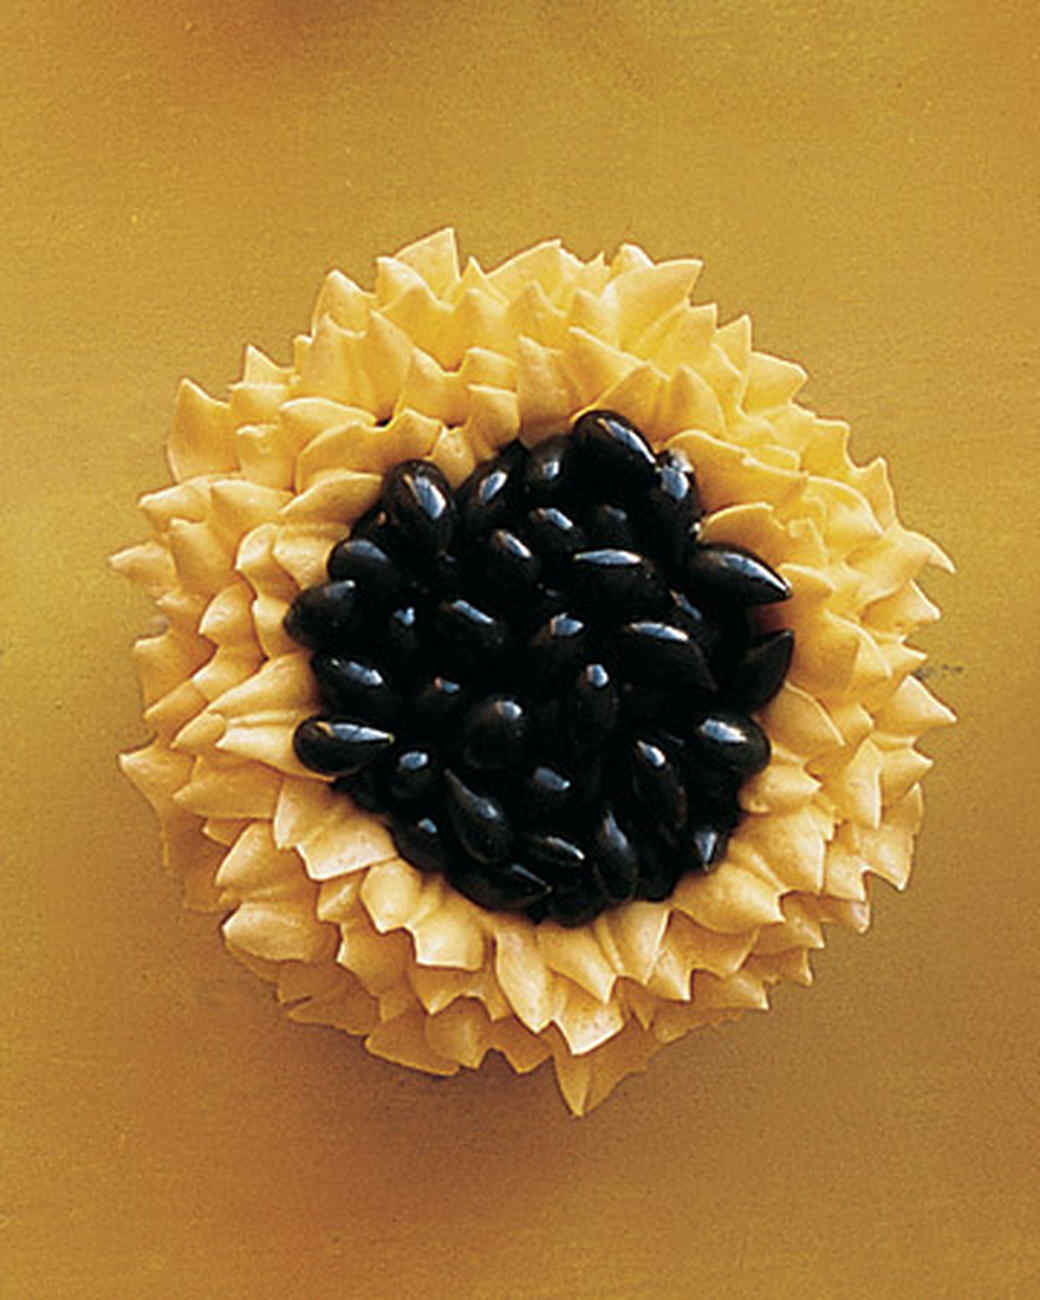 mla104524_0209_sunflower.jpg